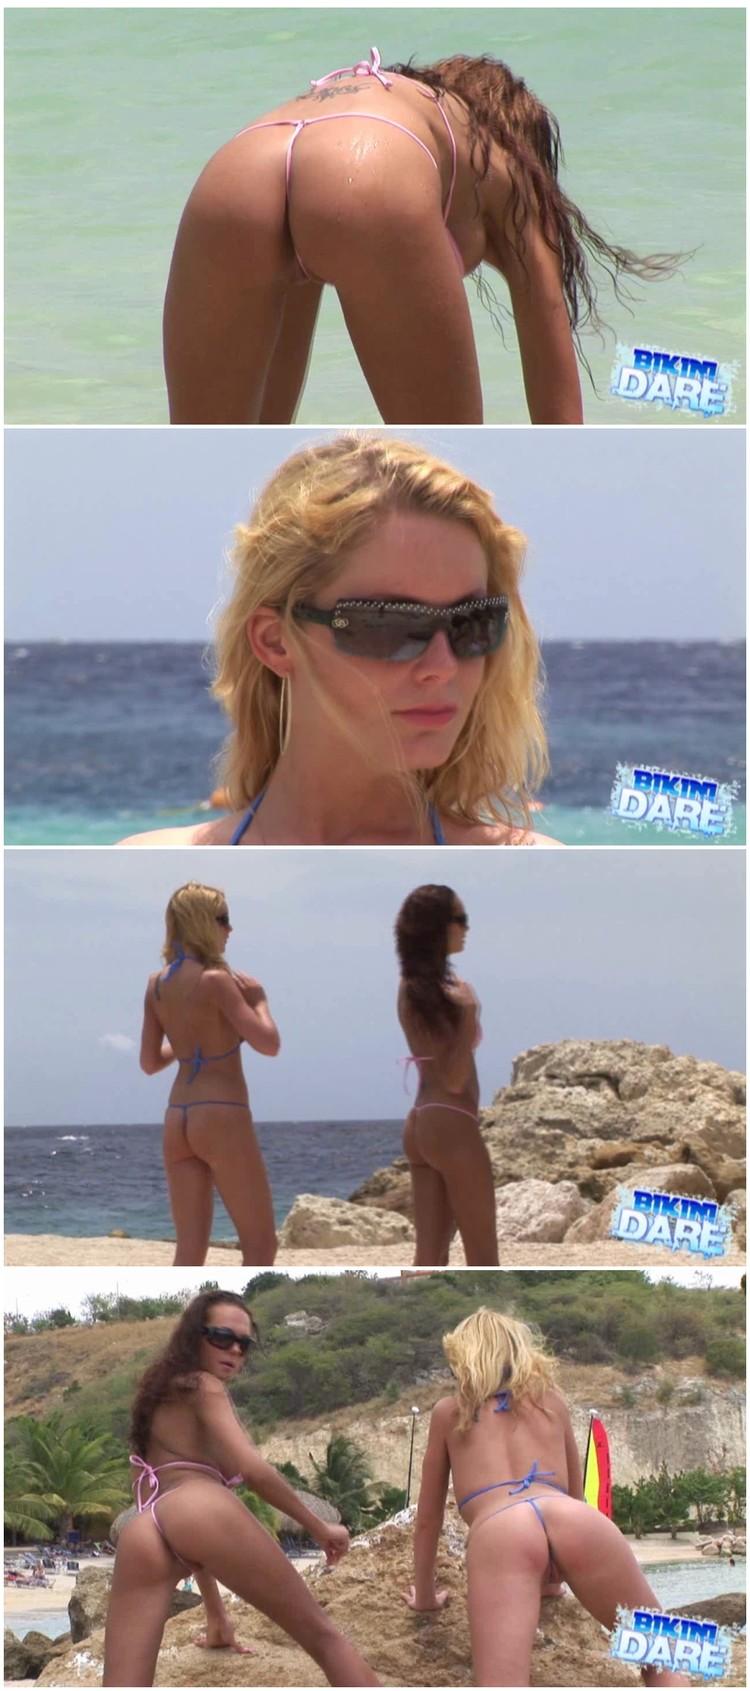 bikini-dare110_cover_l.jpg